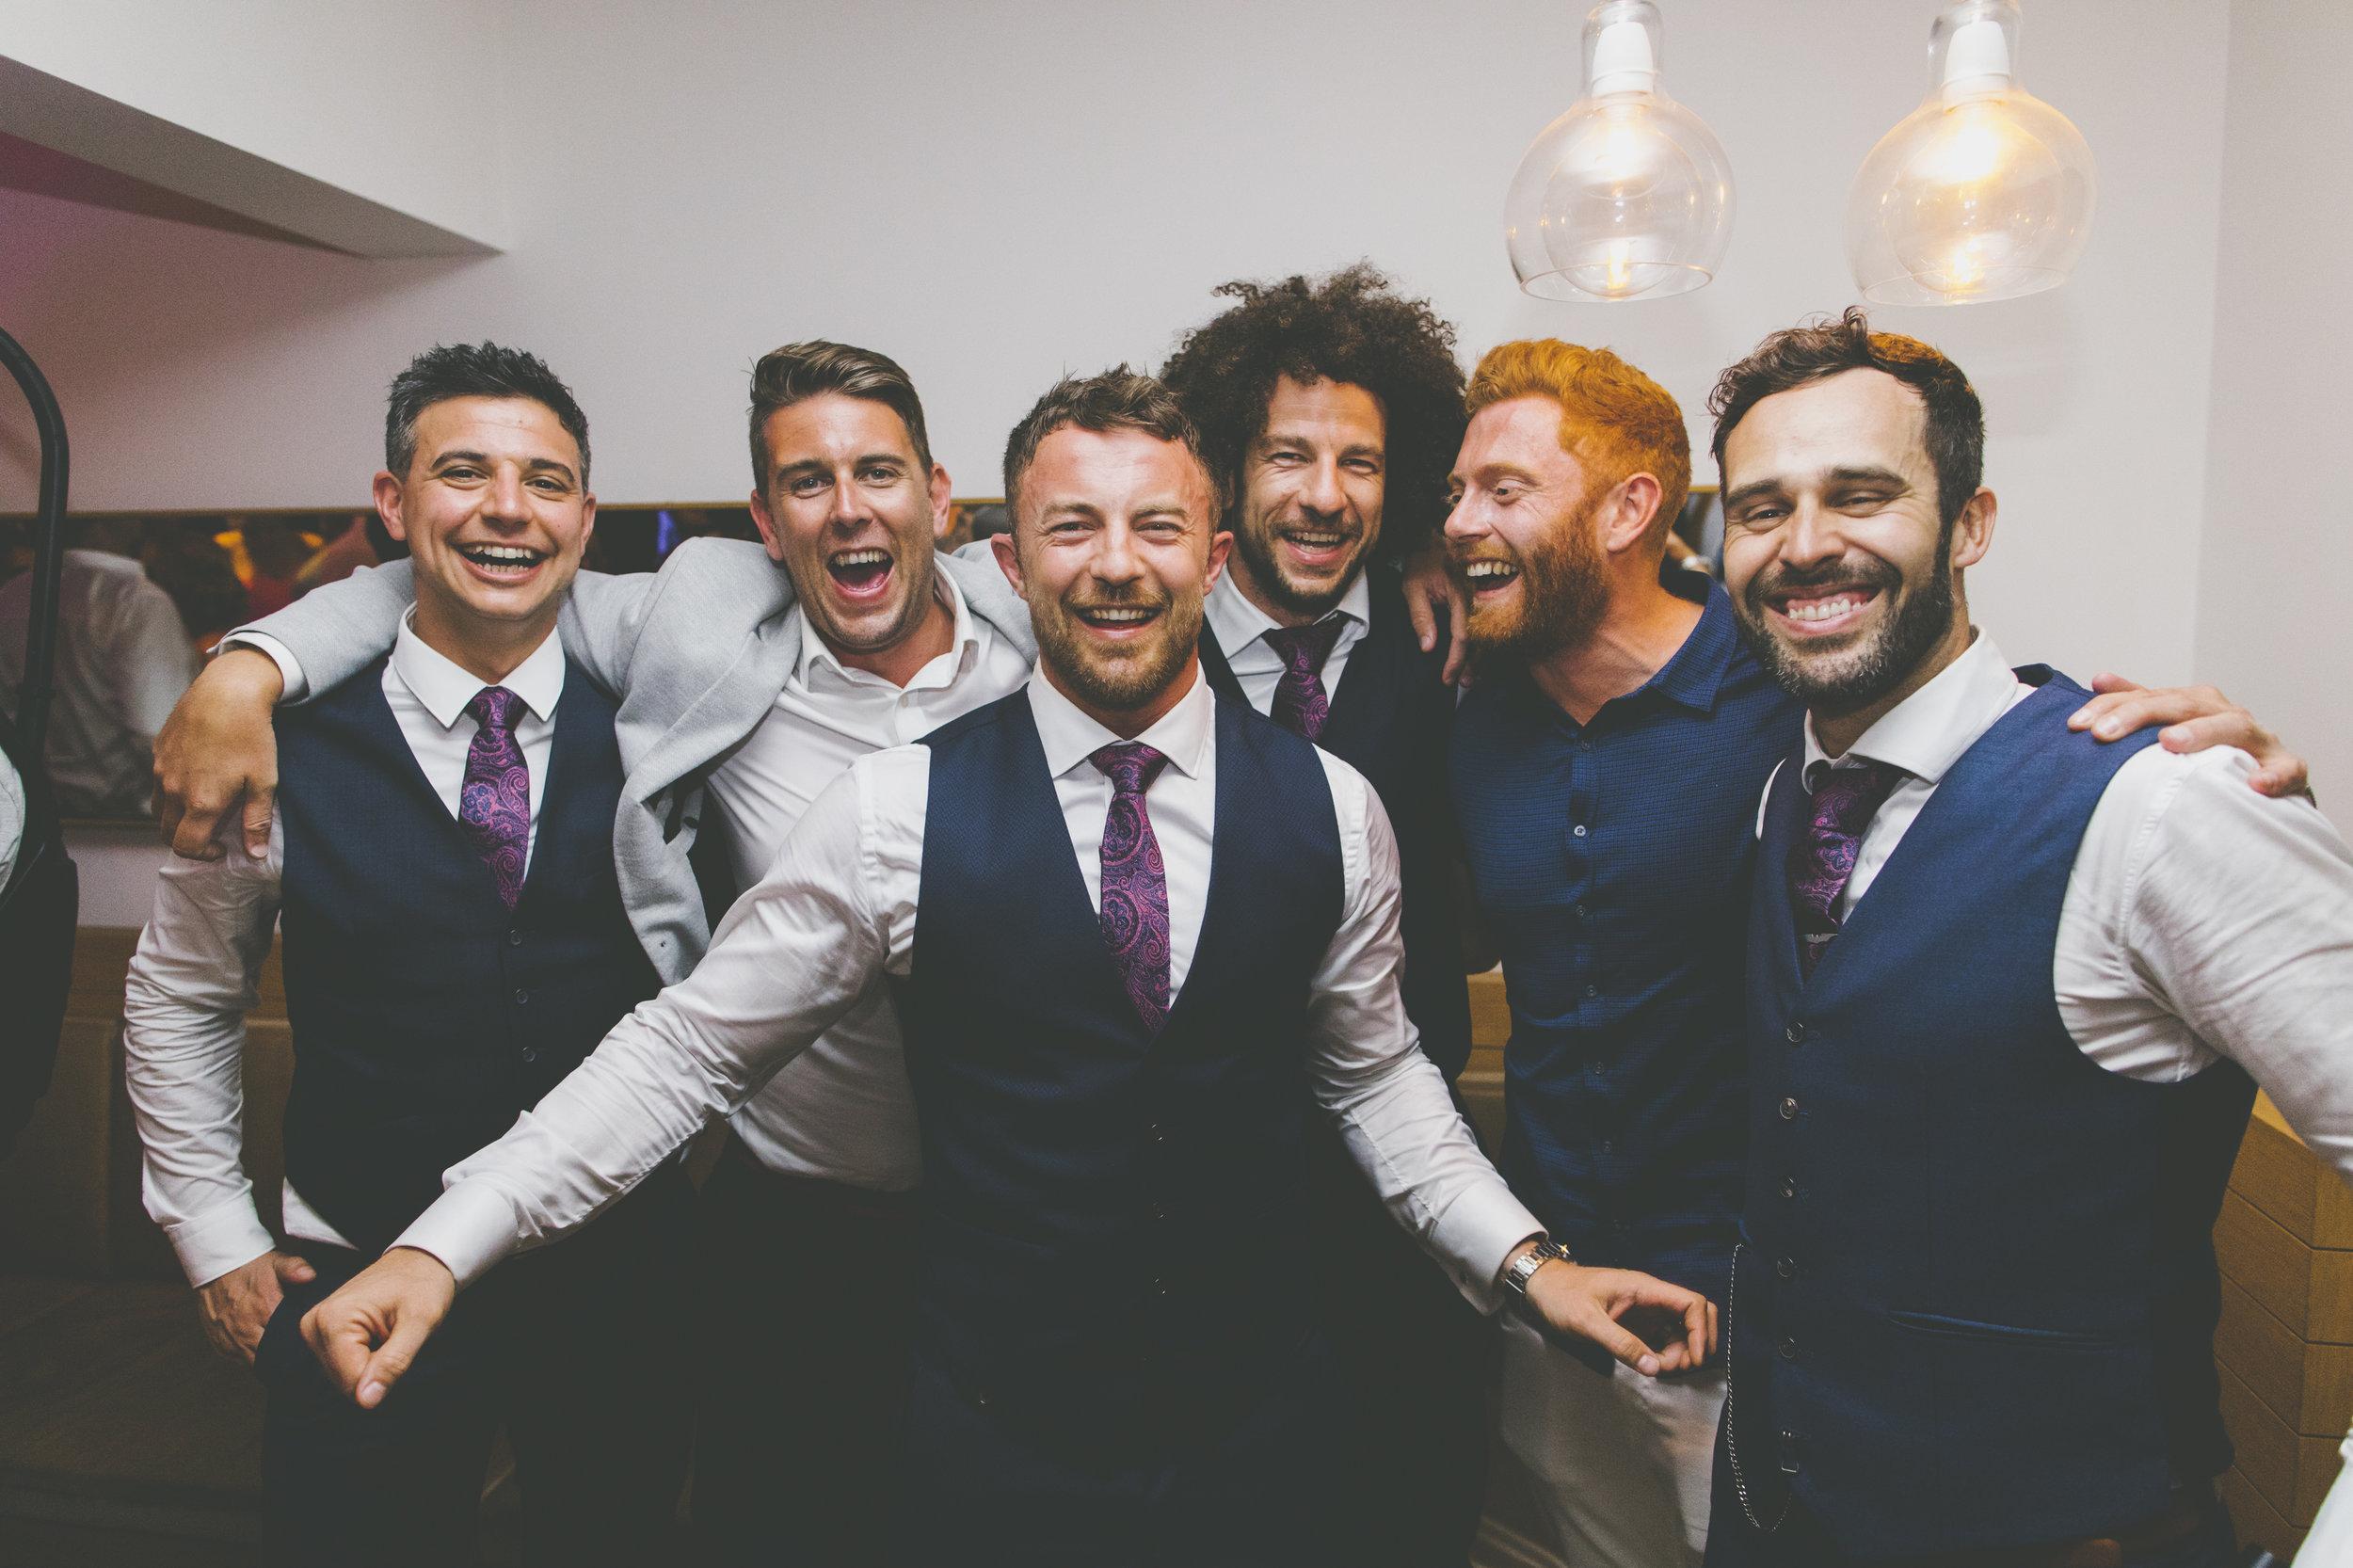 Guests having fun at The Public Dining Room Balmoral Sydney Wedding Reception